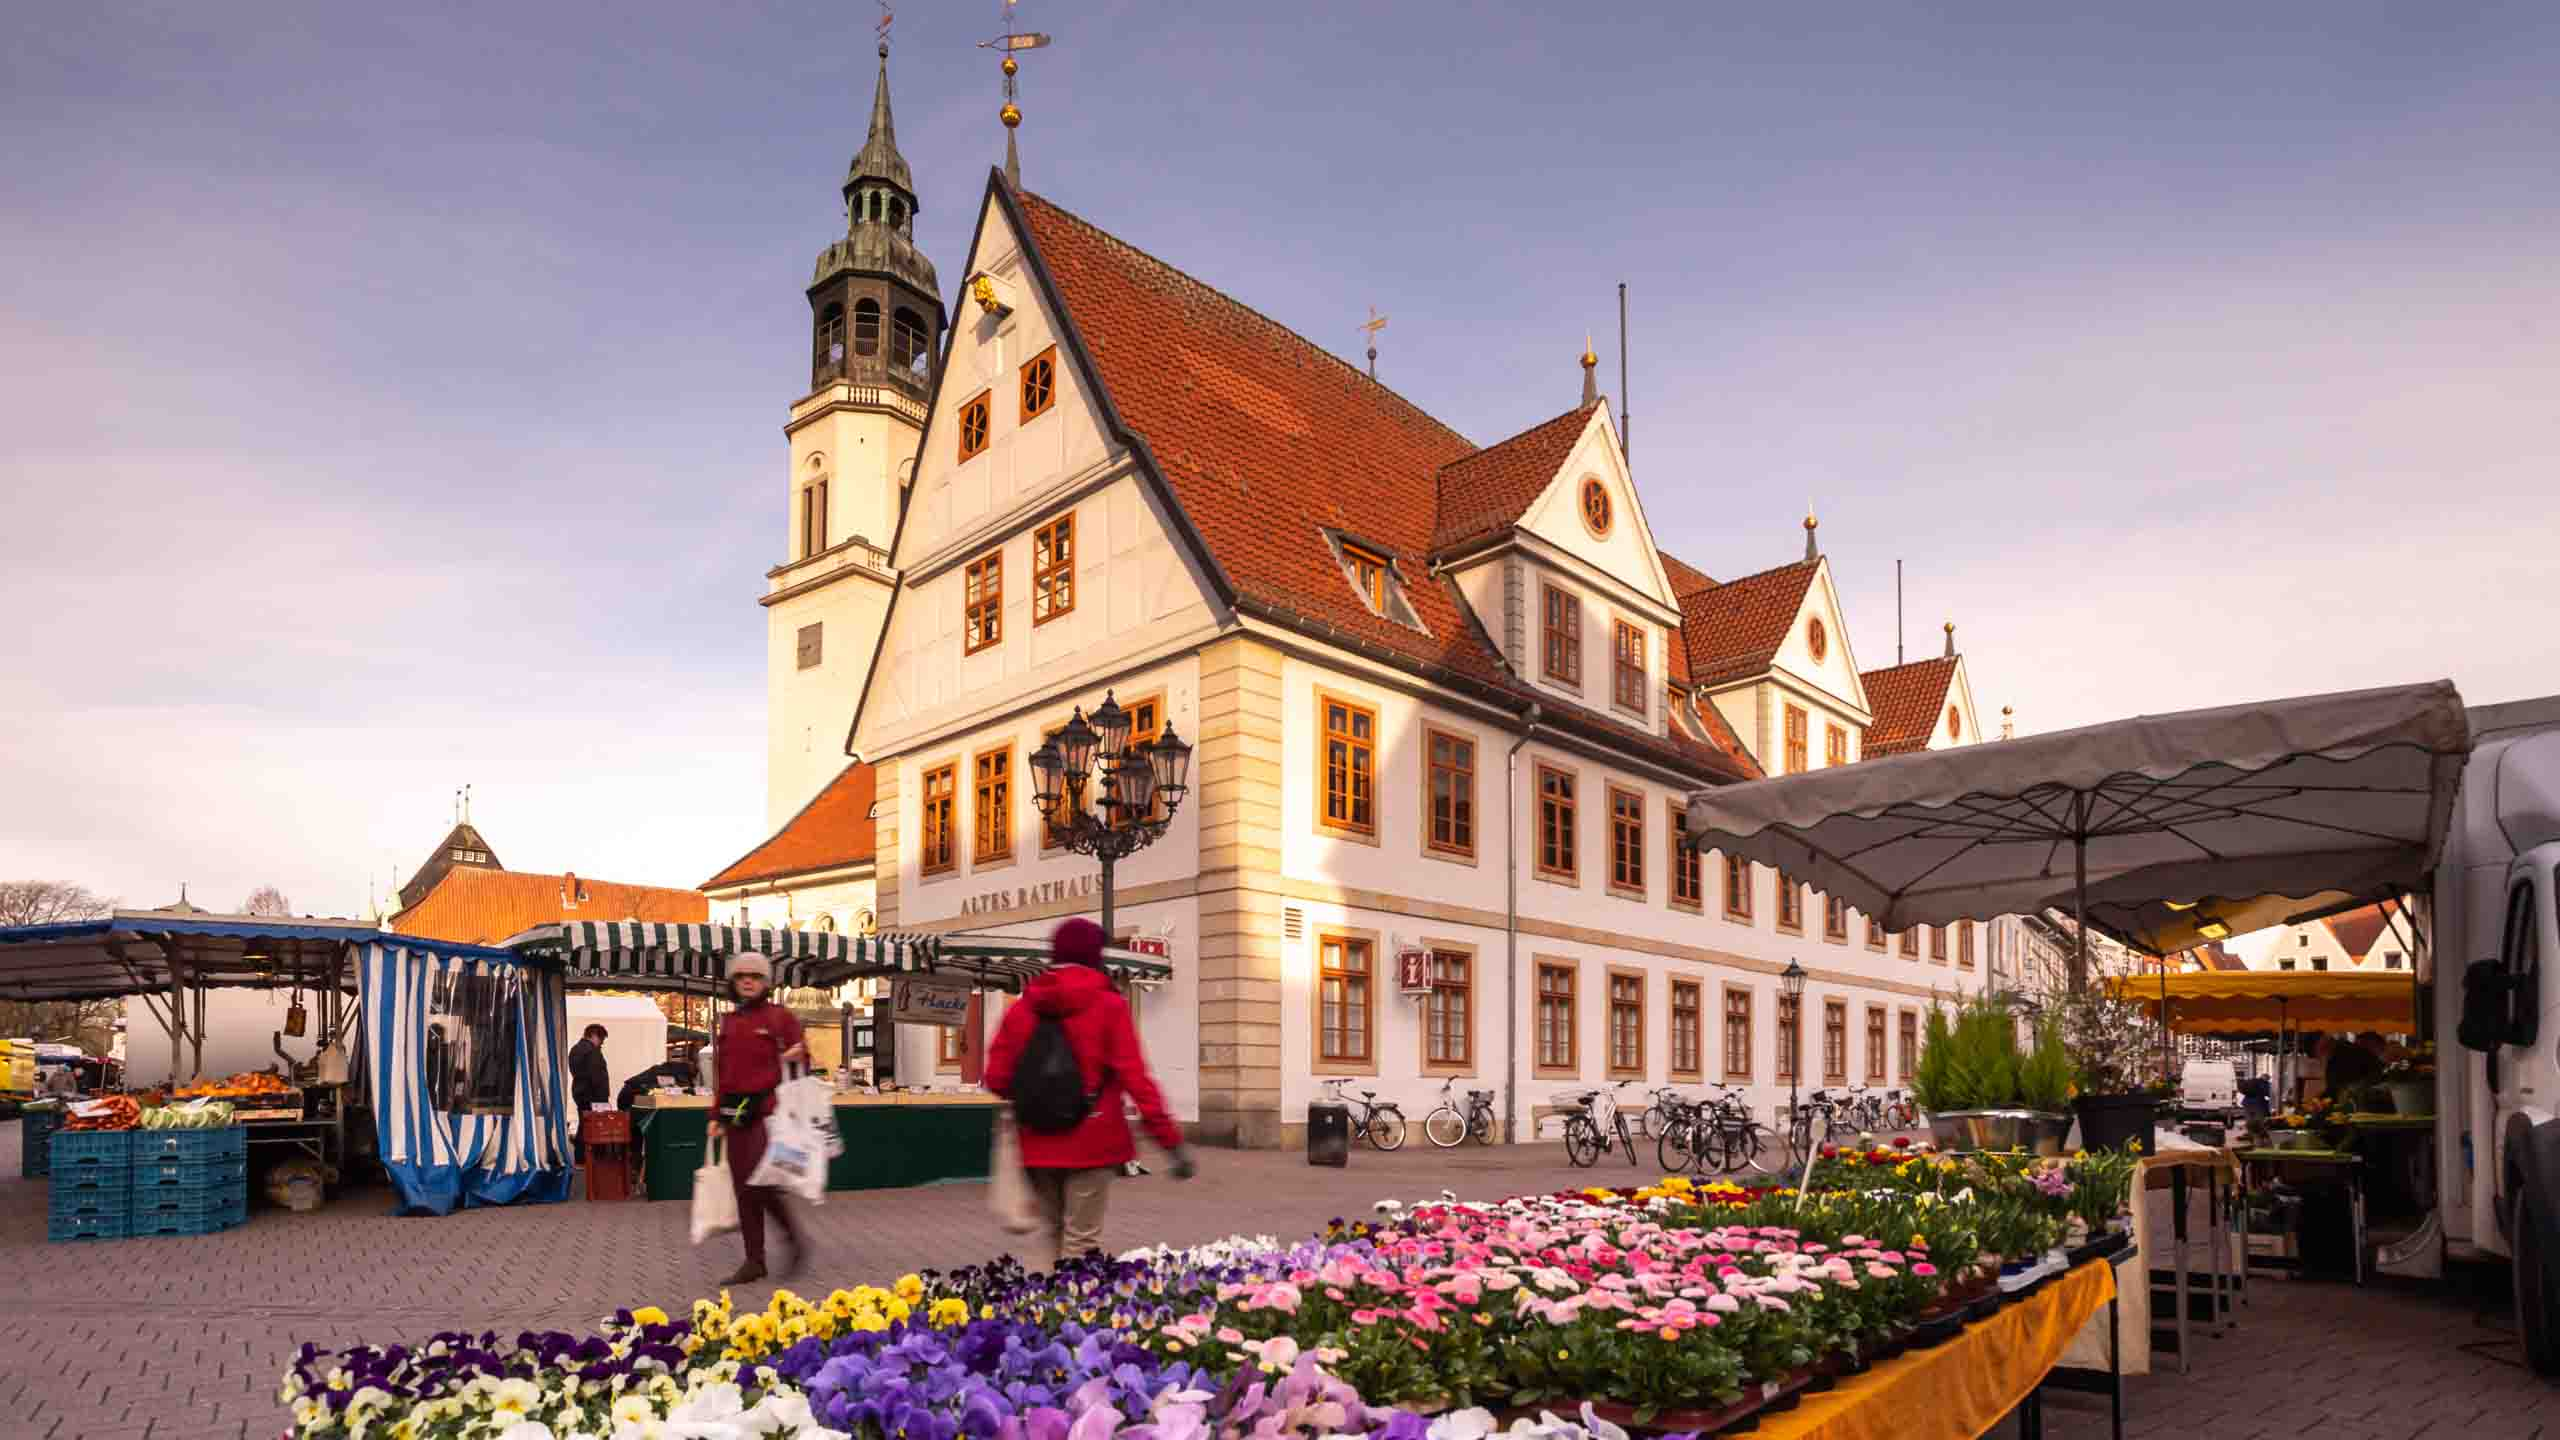 Celle Wochenmarkt Altstadt